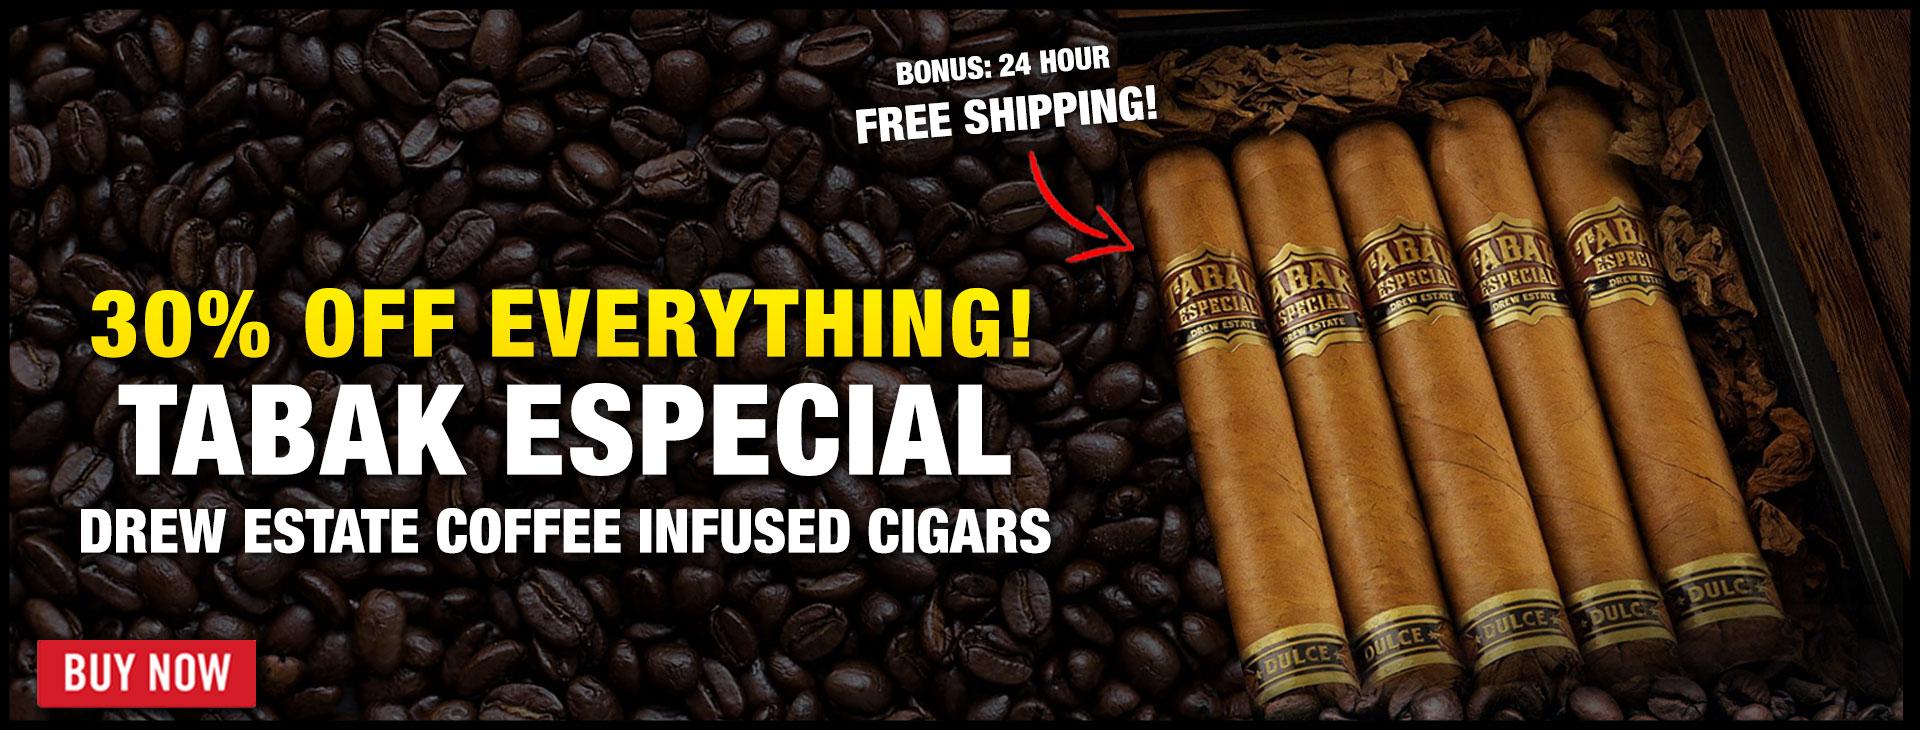 tabak-especial-2021-banner.jpg